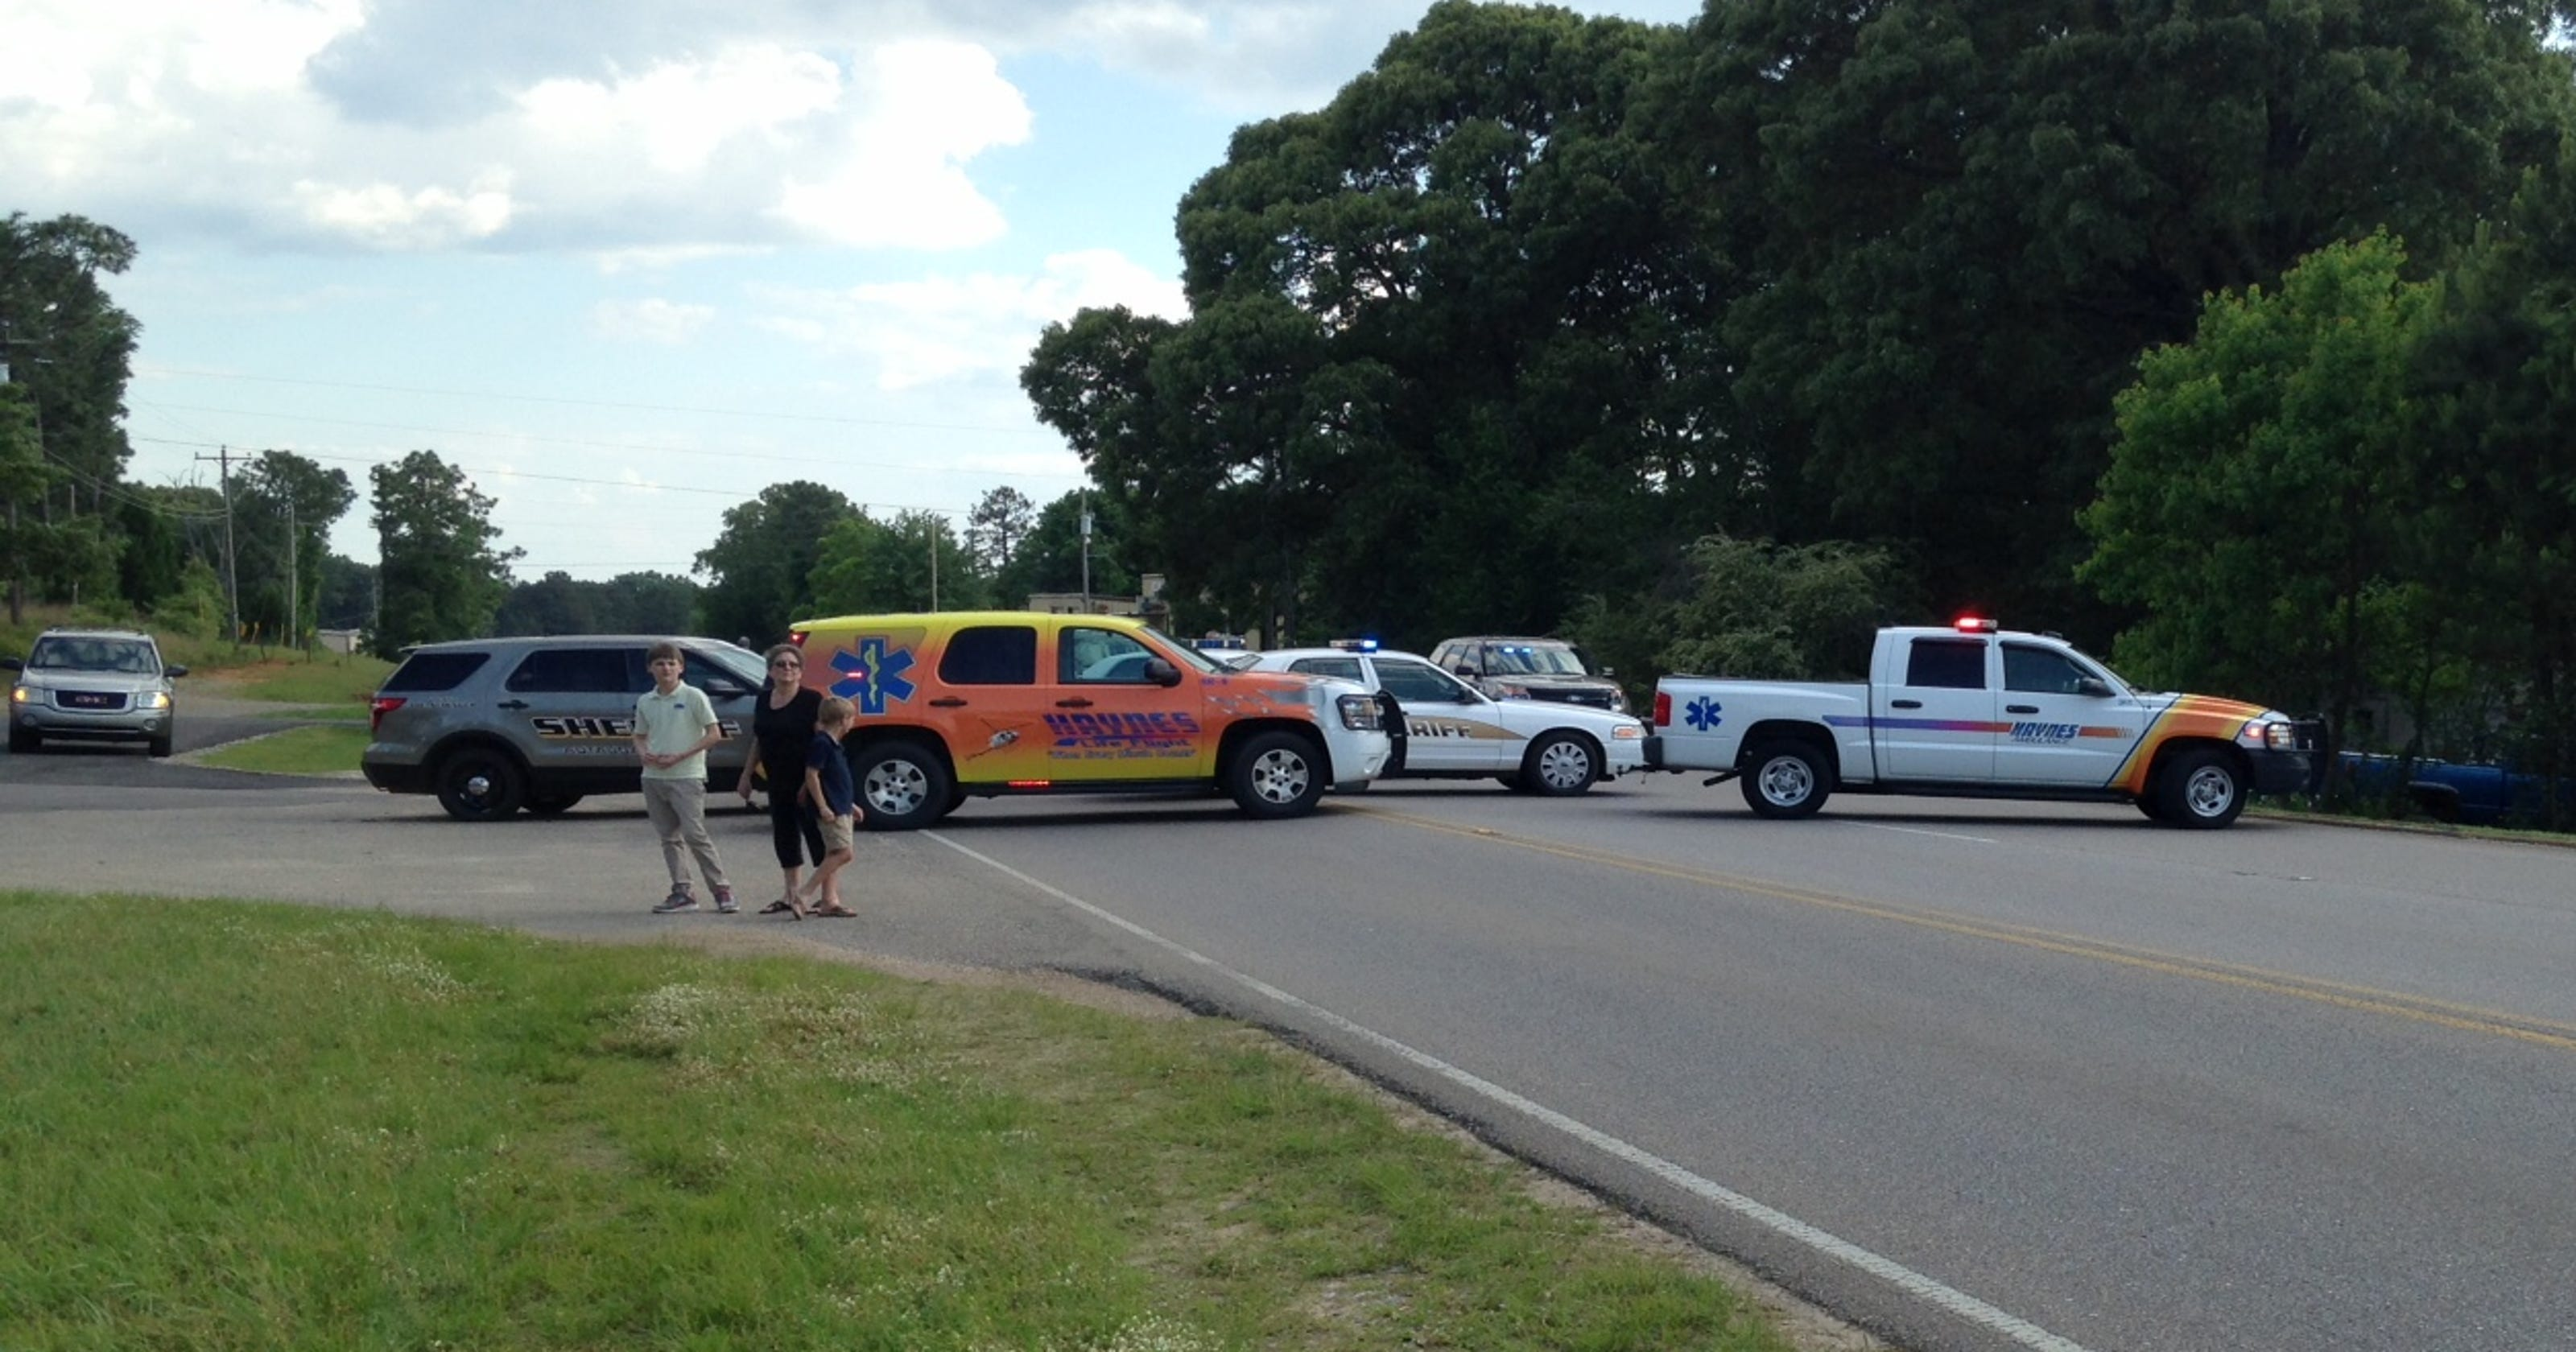 Officials ID 2 killed in crash near Prattville